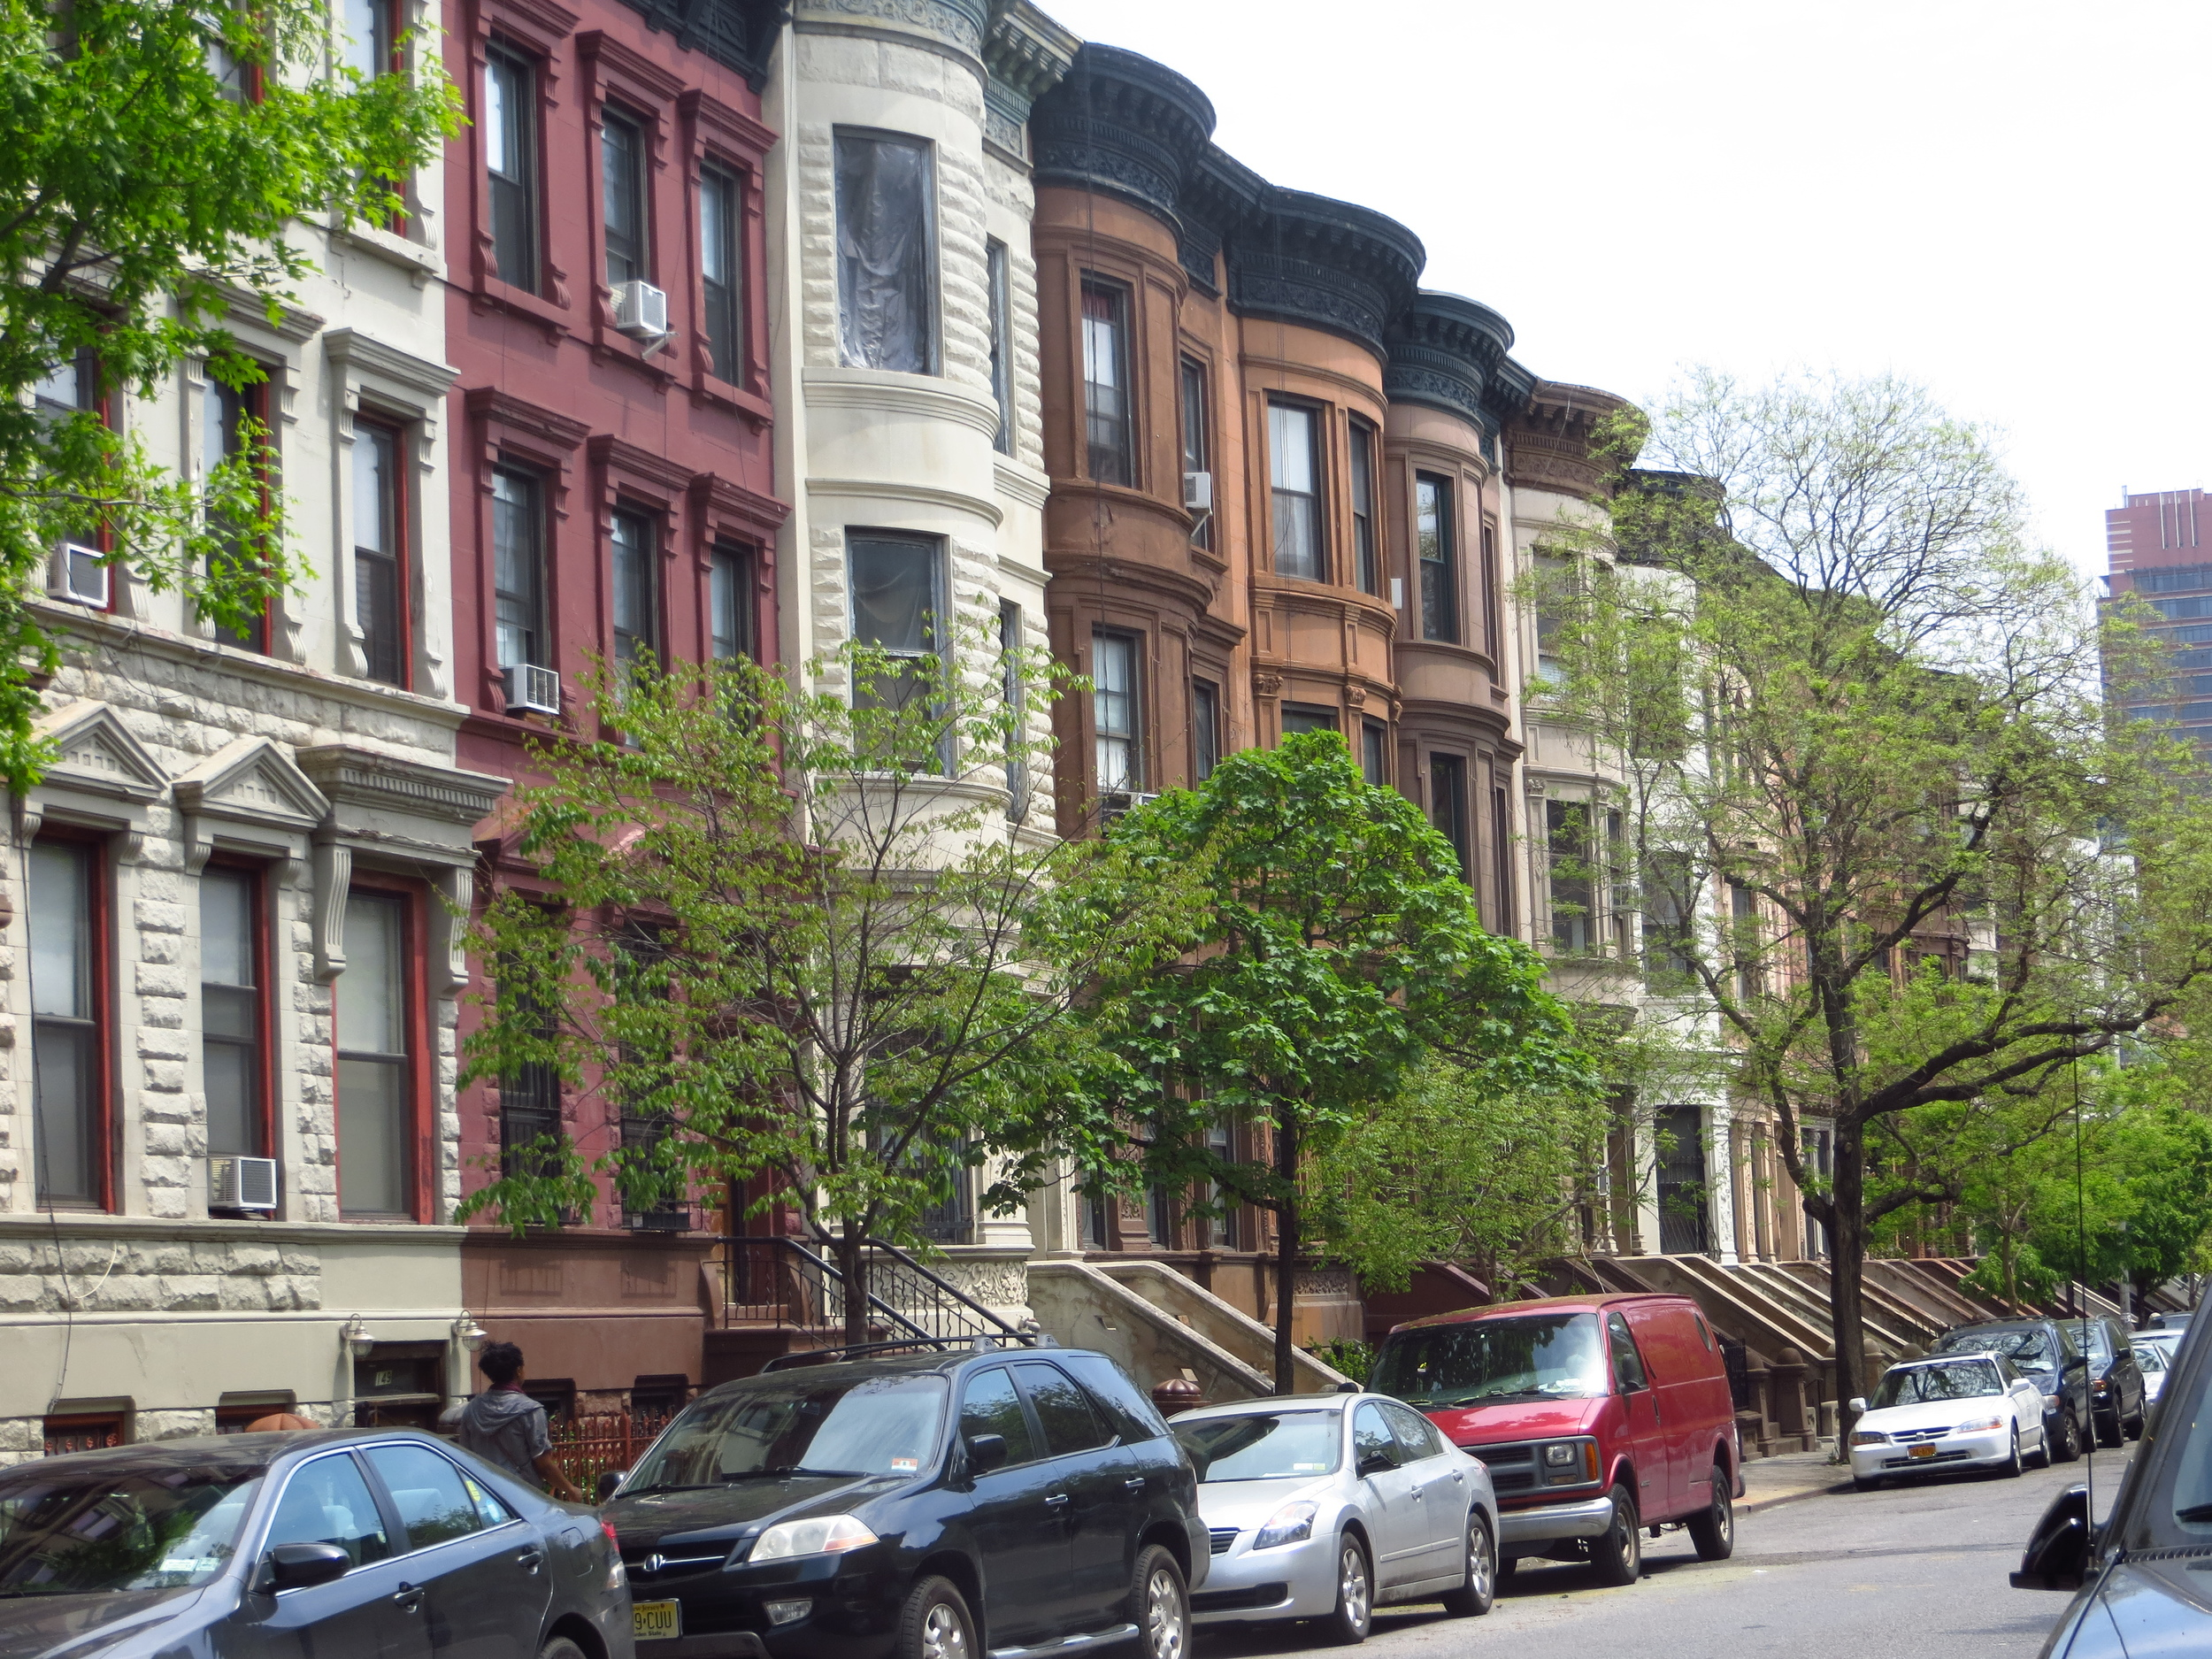 More Harlem brownstones